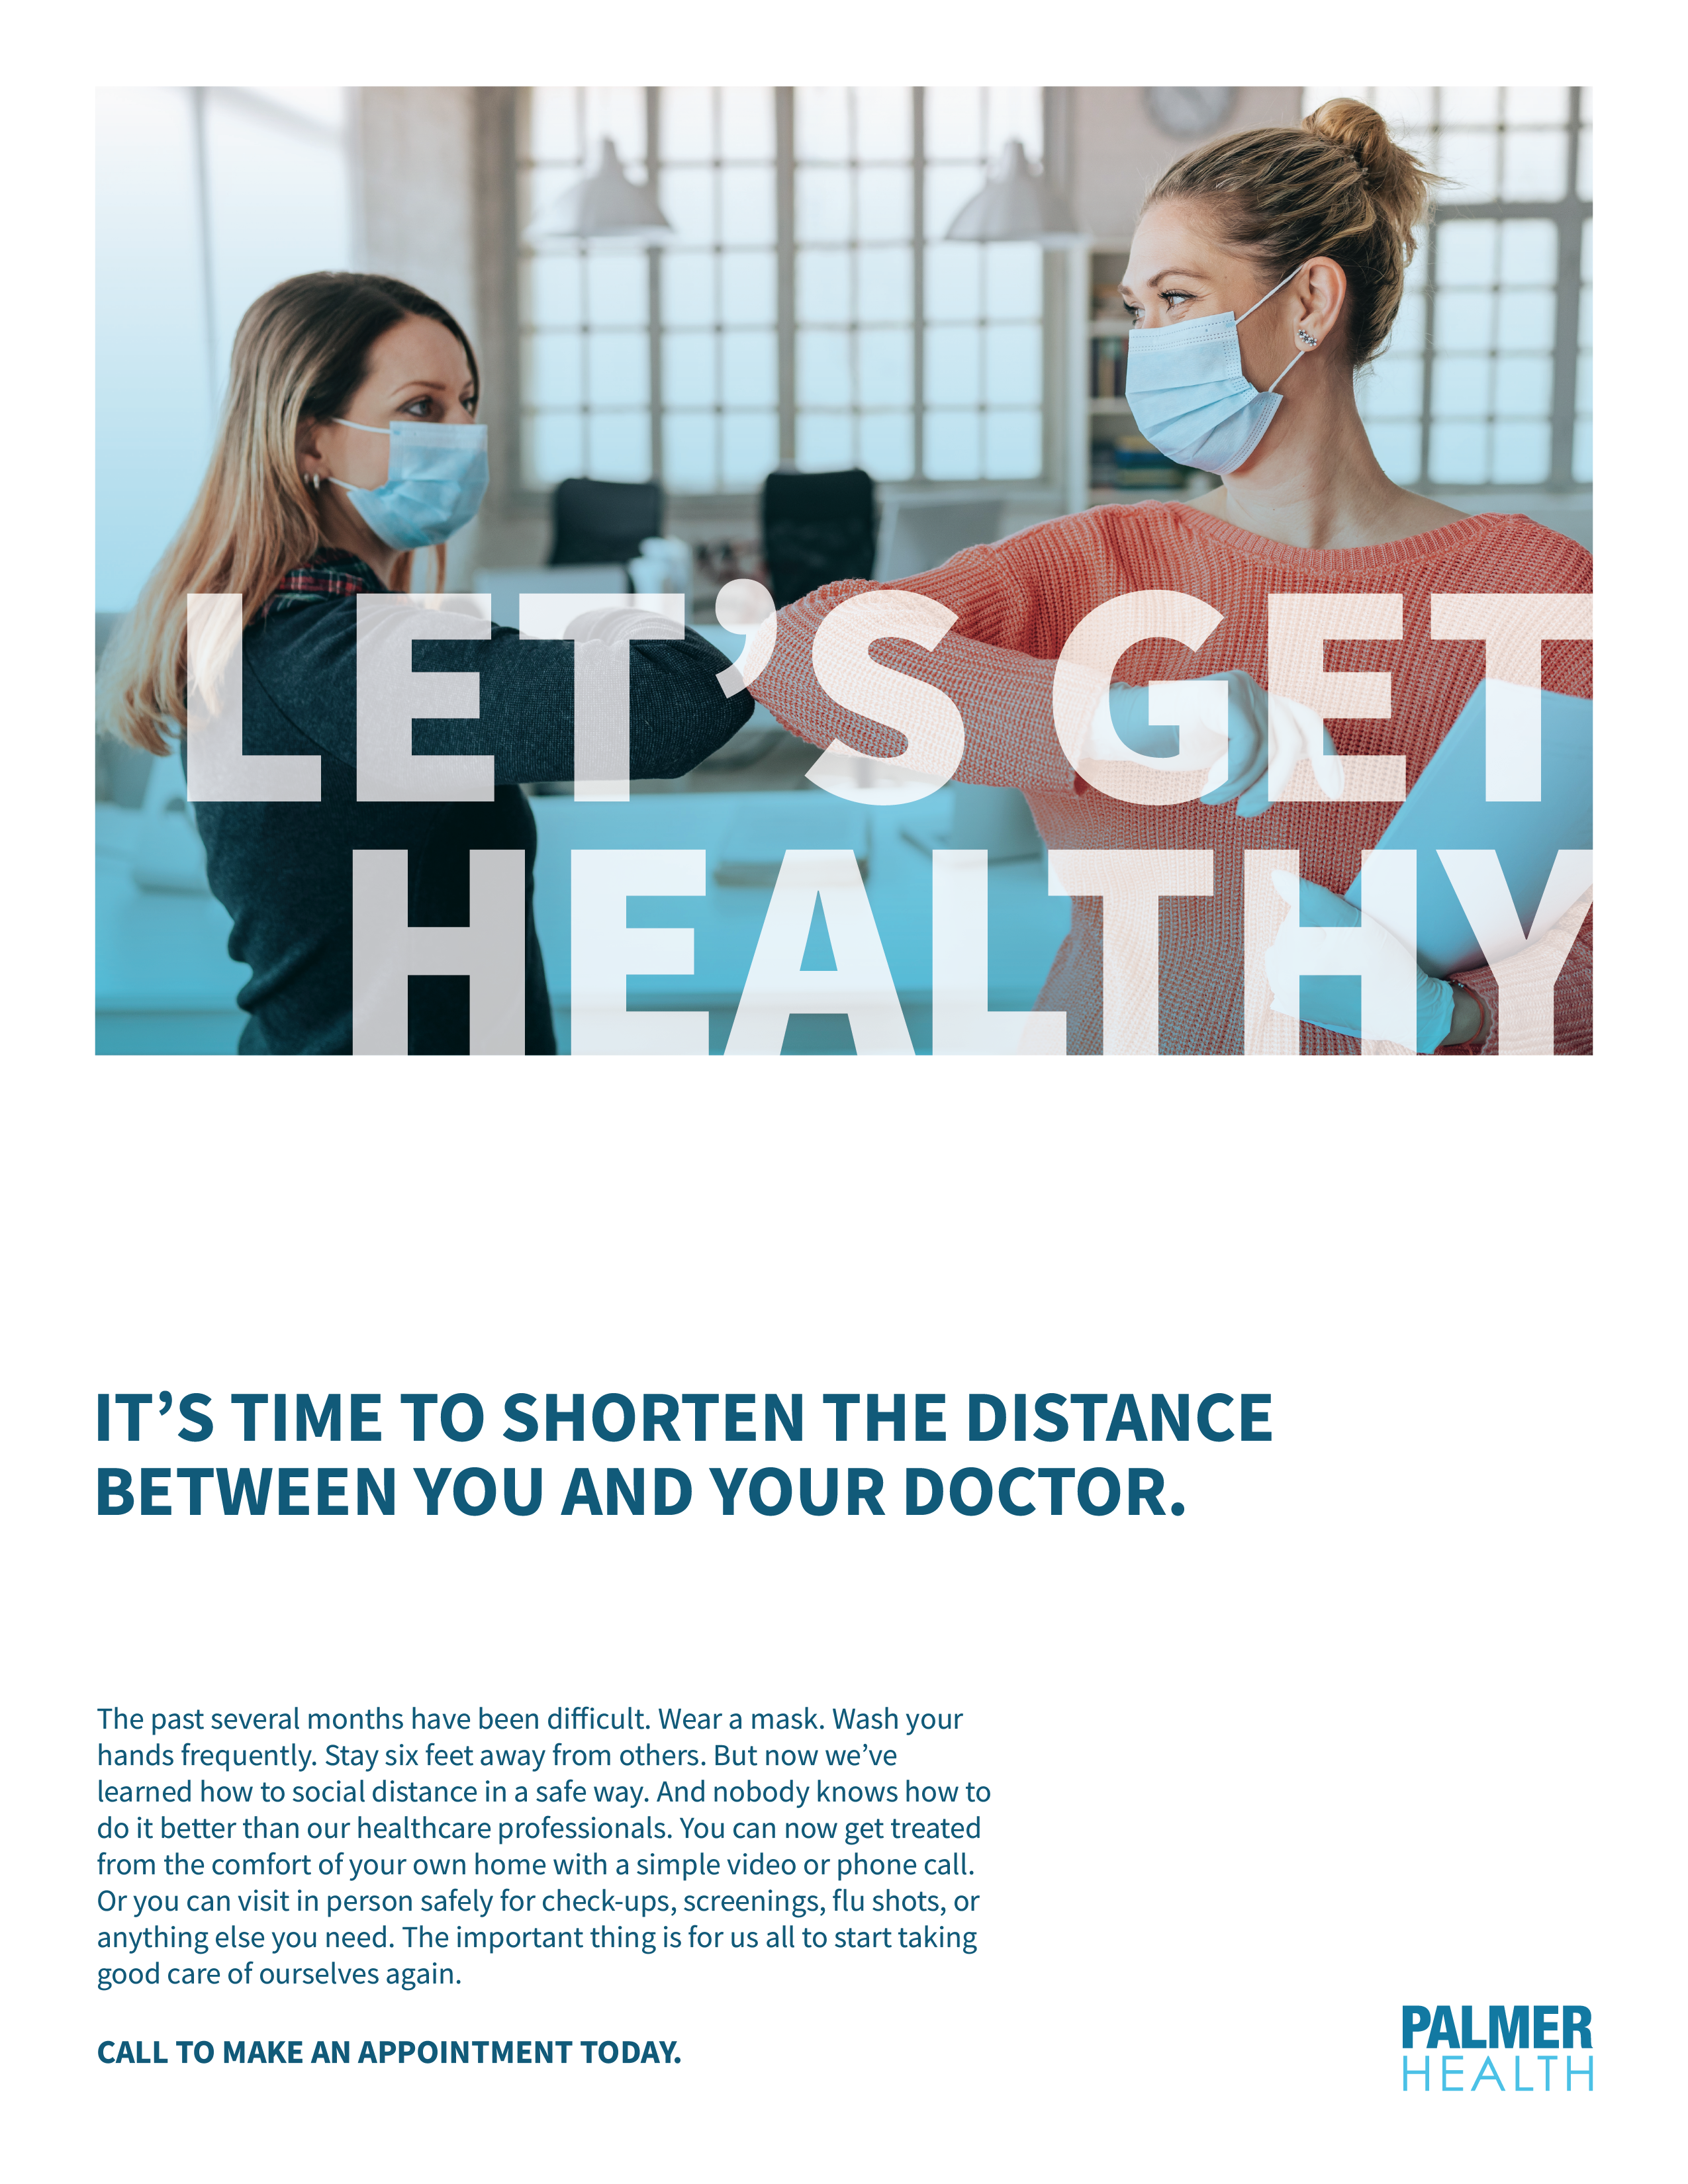 36152 Palmer health as dev for website-get healthy-v4-aug 20-02